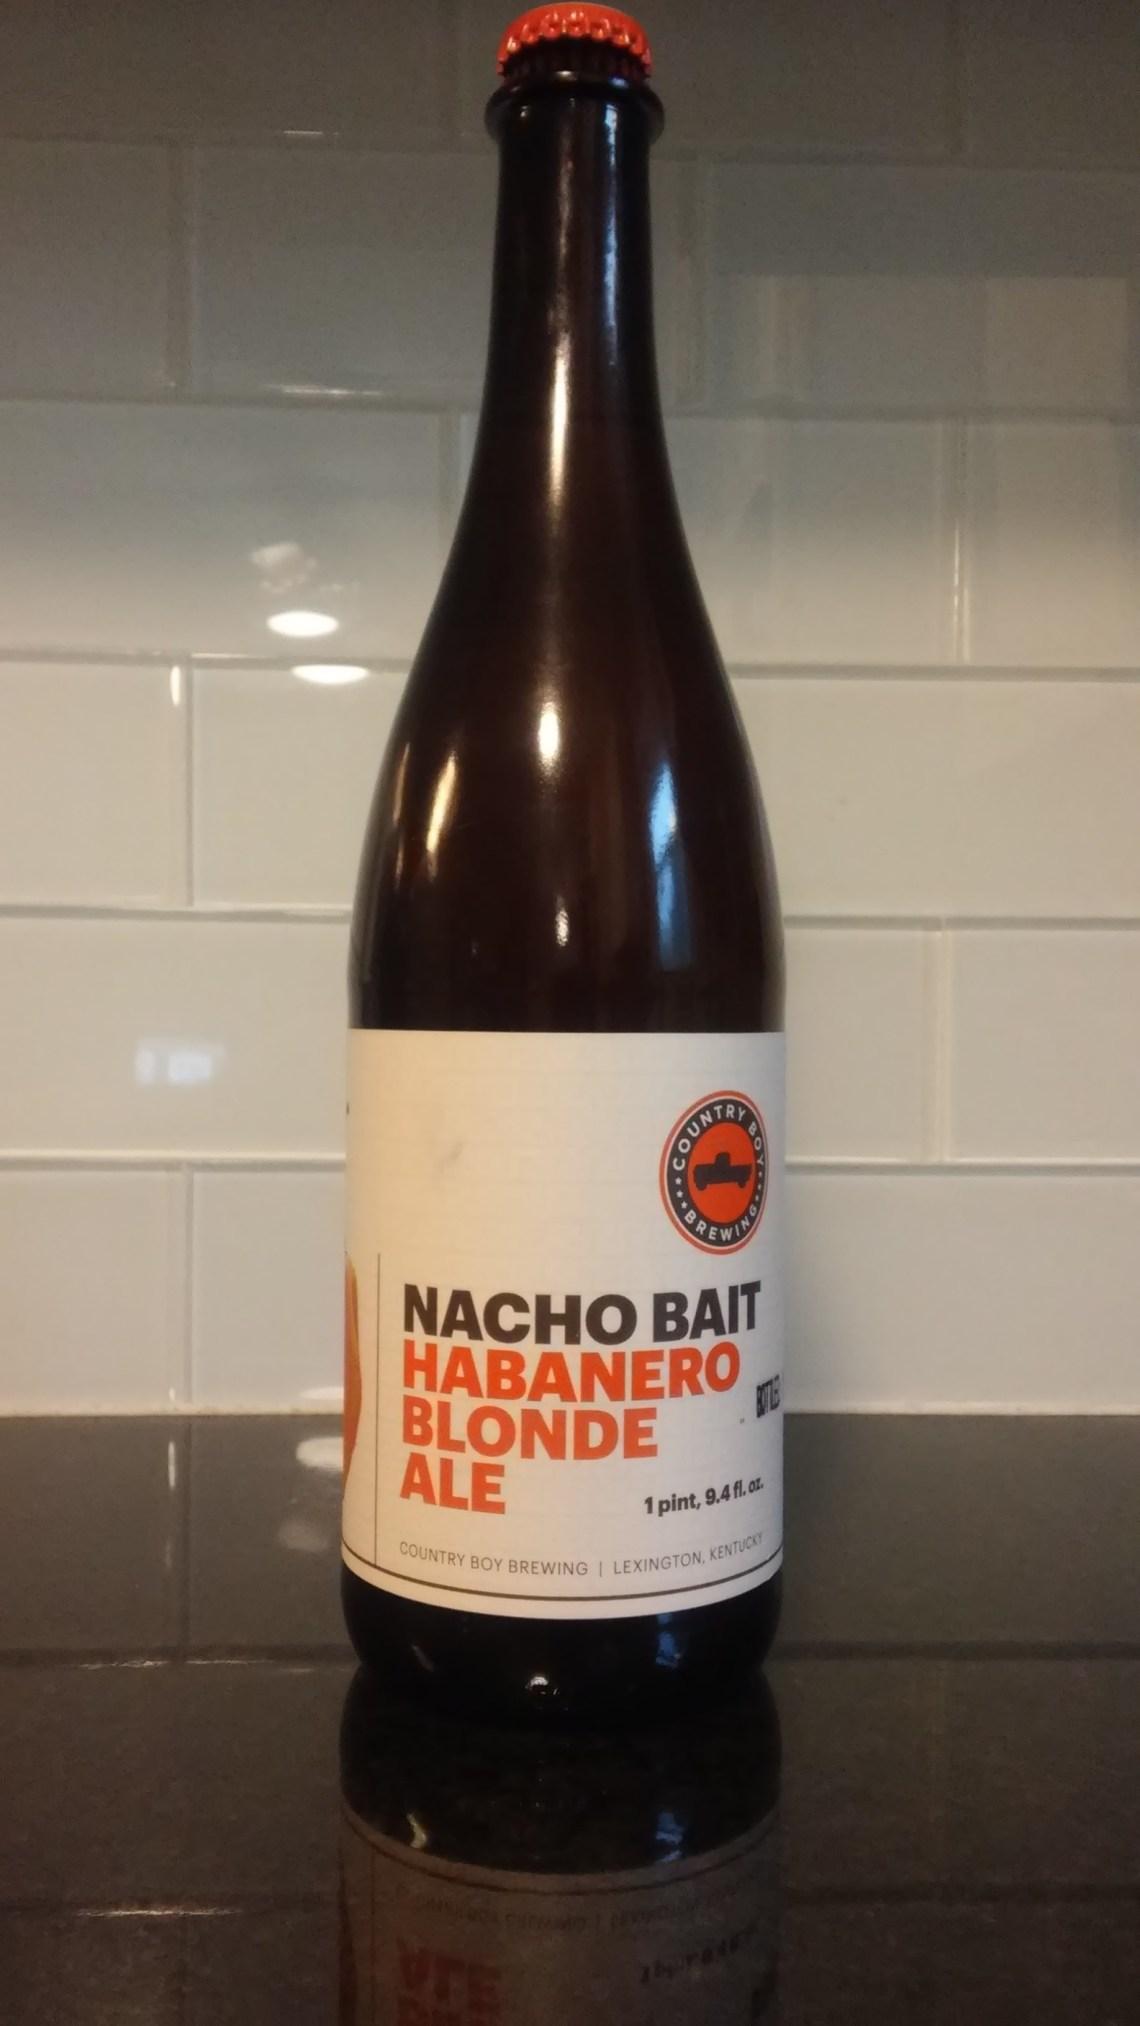 Country Boy Brewing Nacho Bait Habanero Blonde Ale